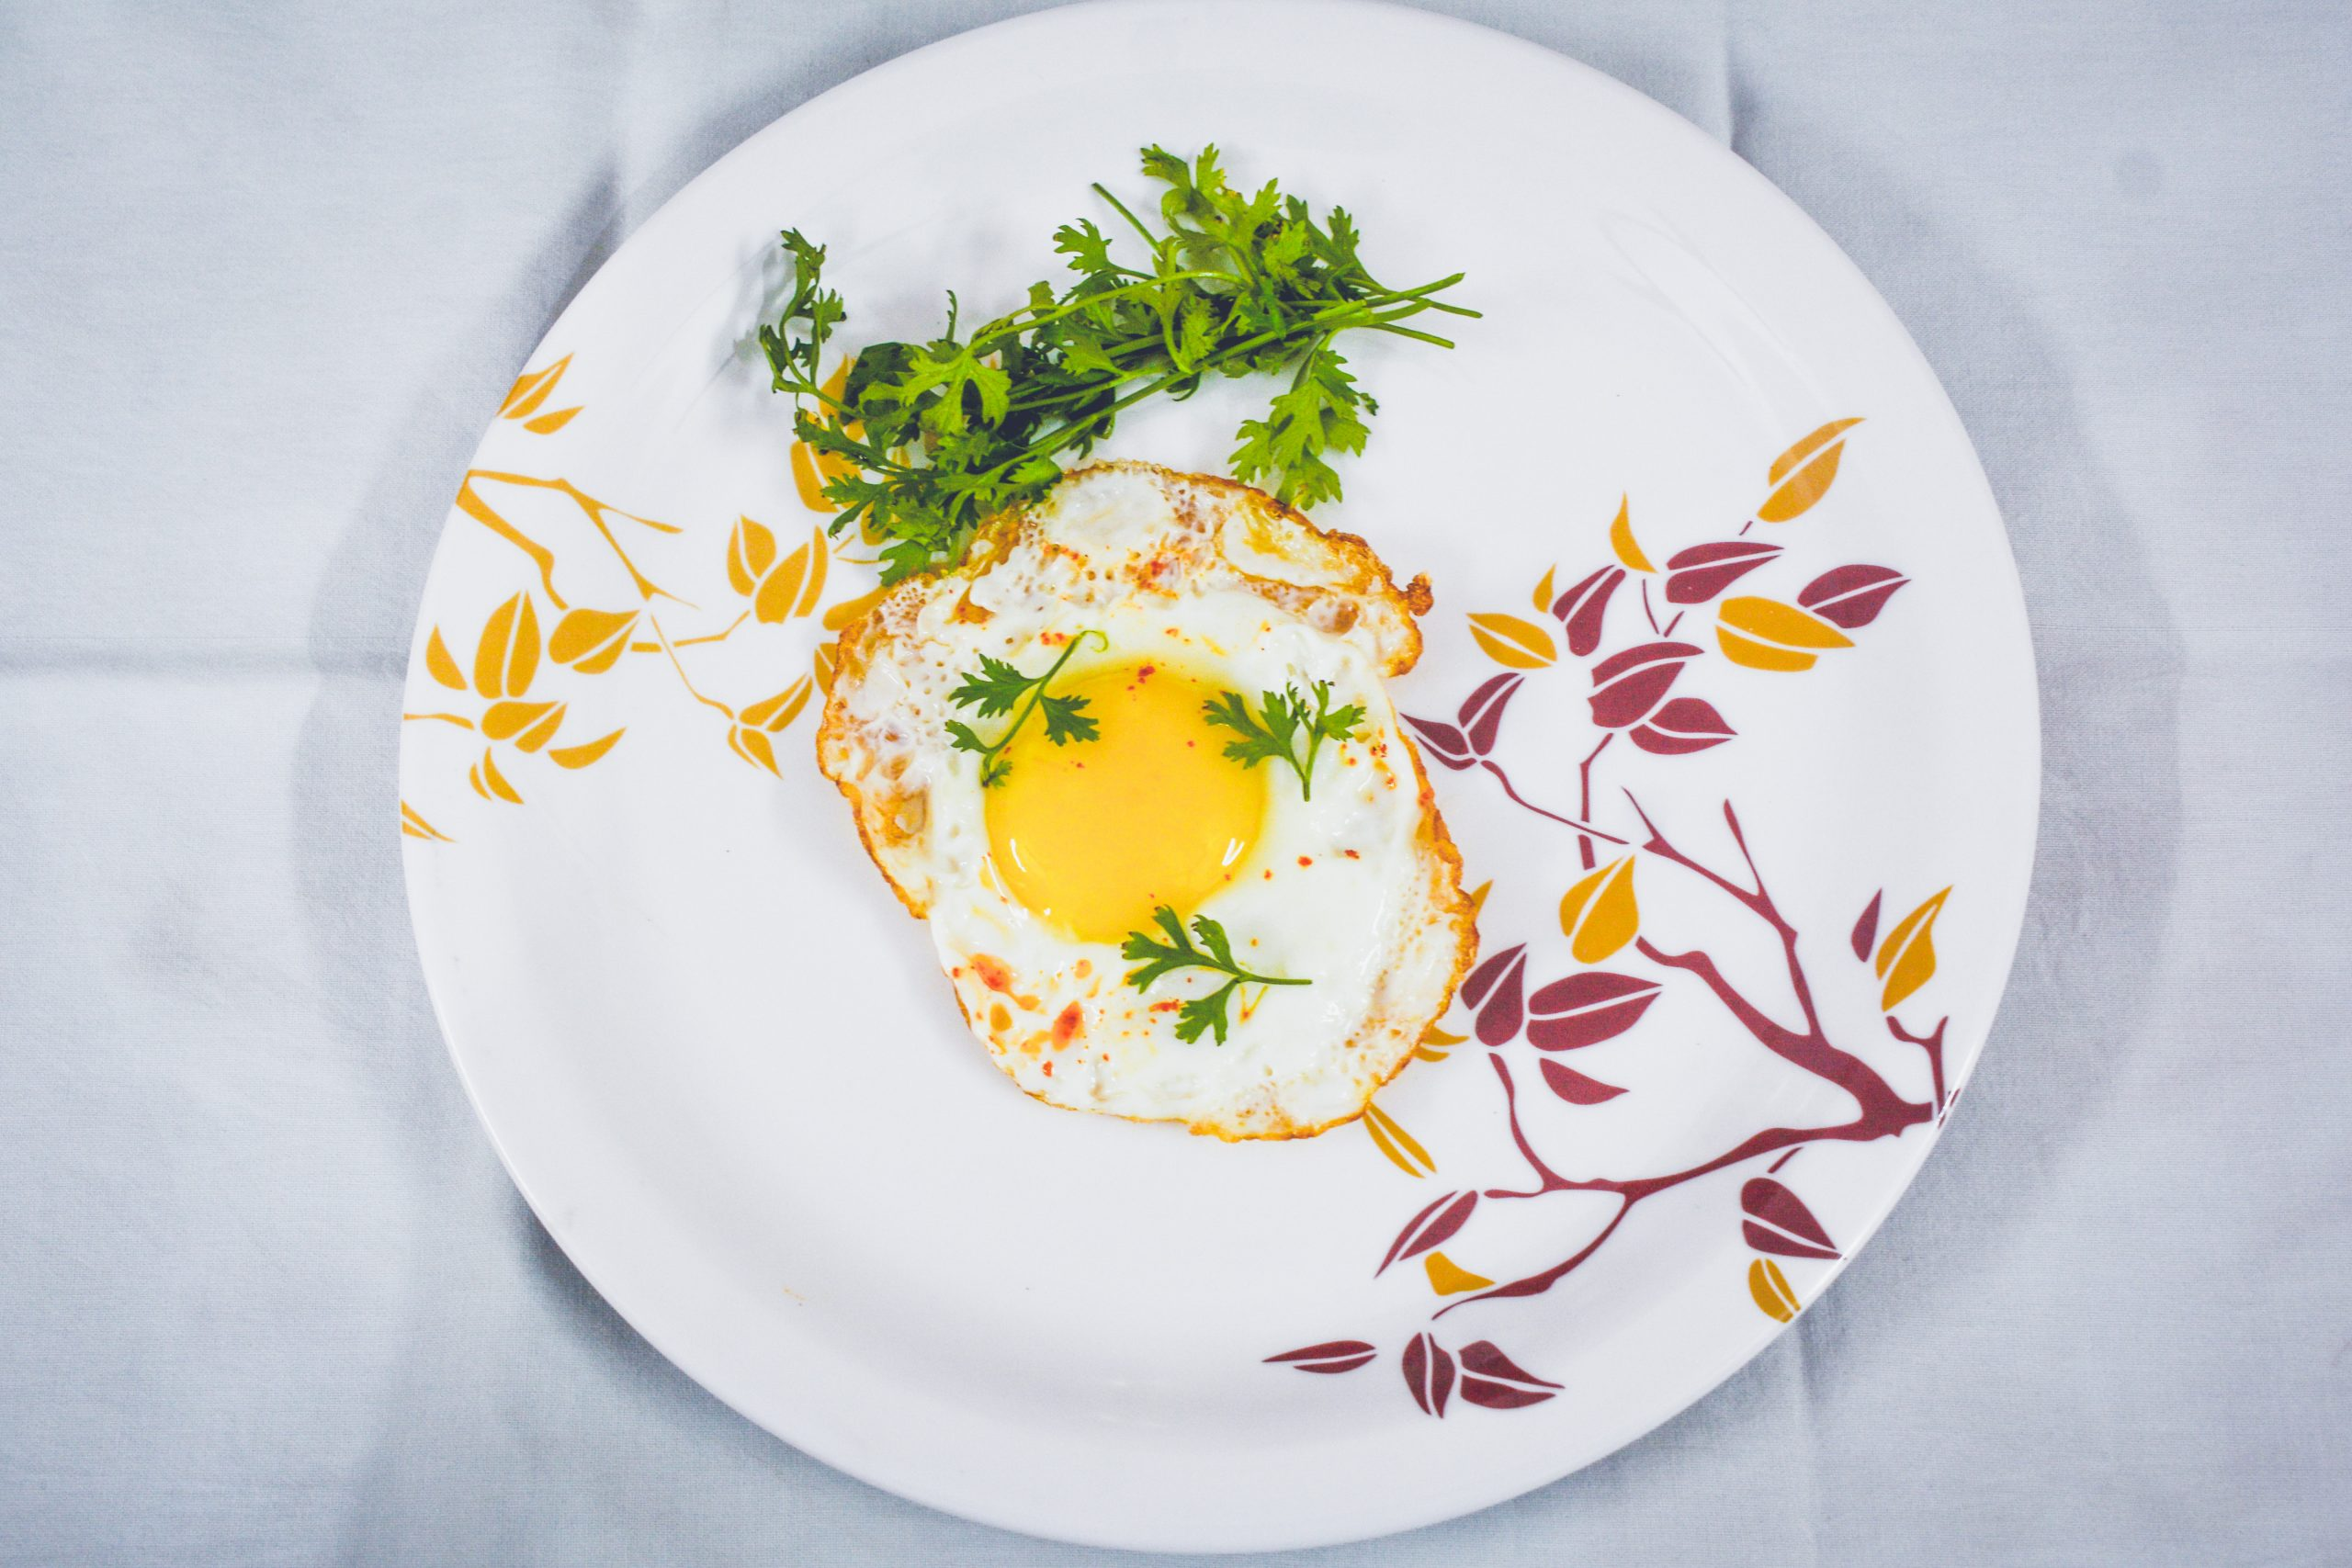 Egg breakfast with Coriander